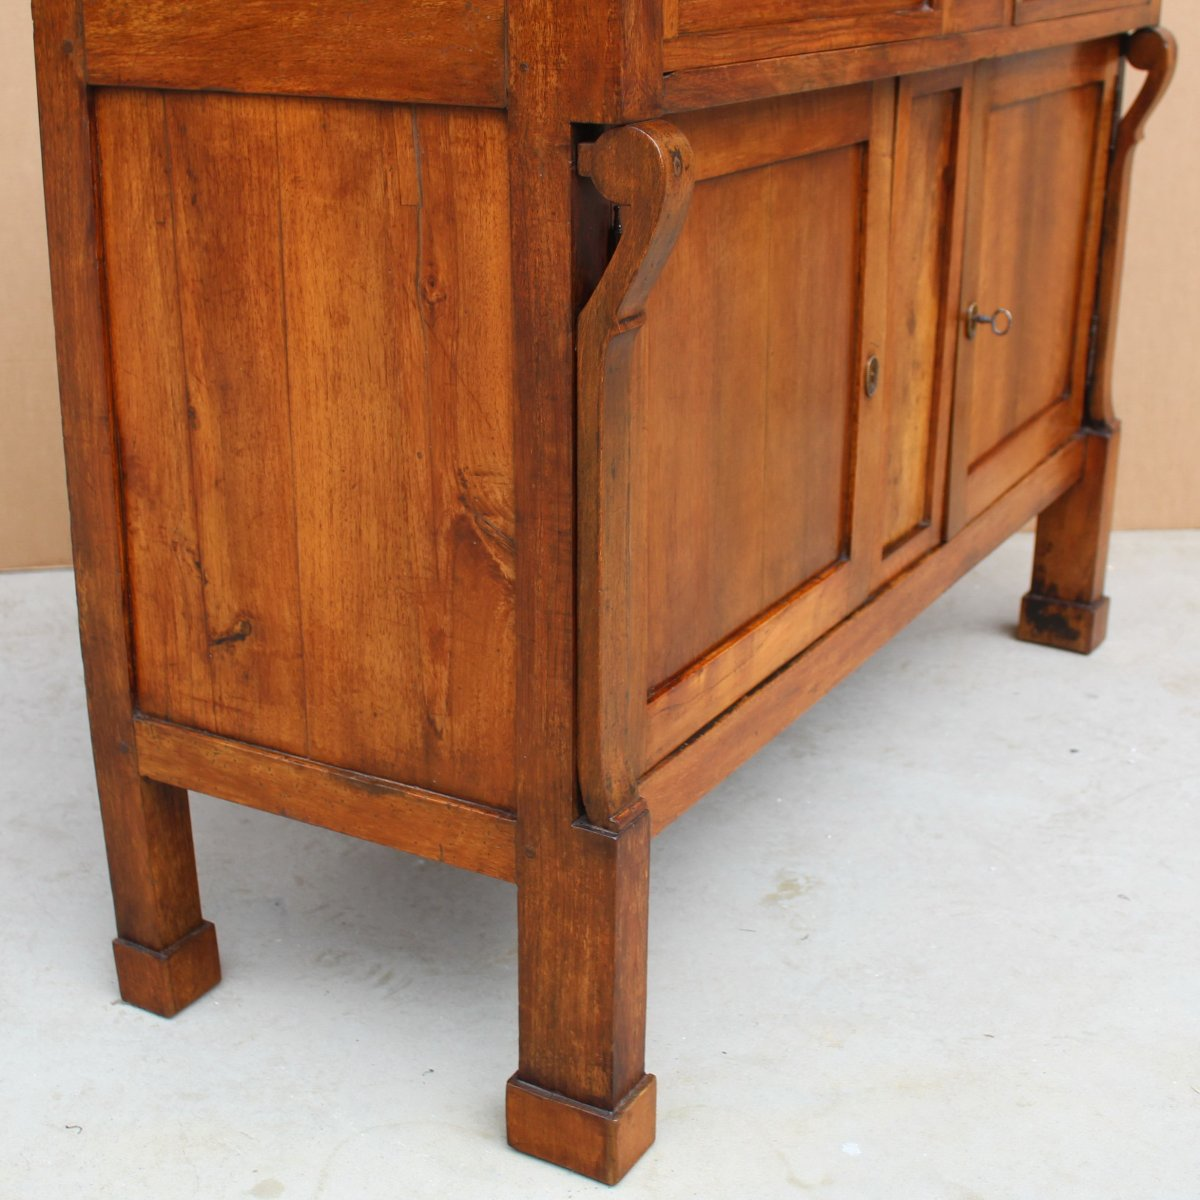 Antique Empire Sideboard Dresser Cabinet Cupboard Buffet In Walnut - Italy 19th-photo-7